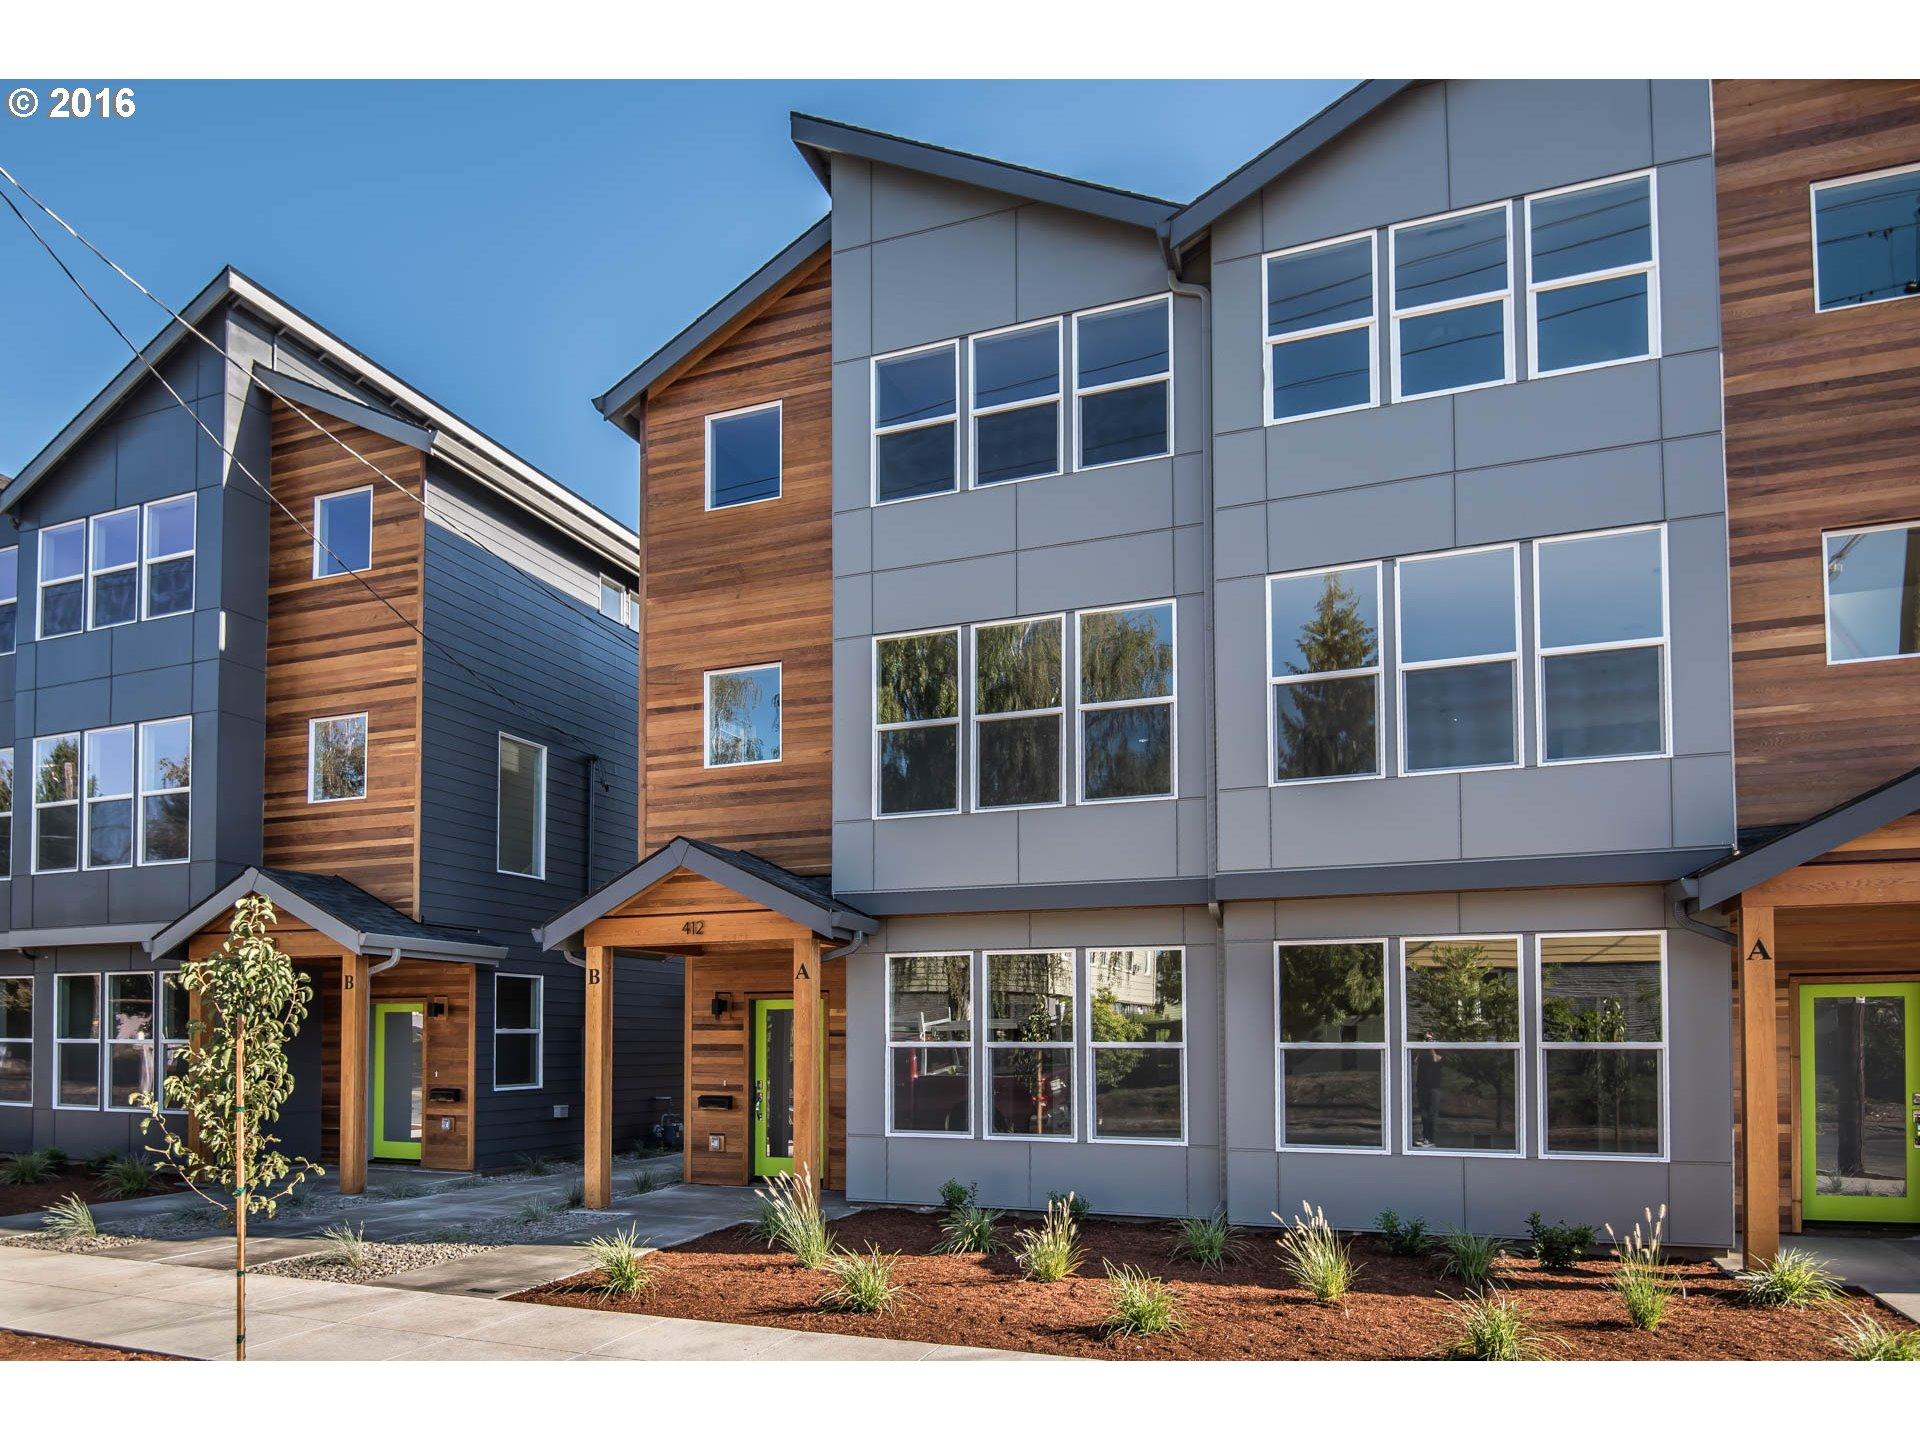 416 N ALBERTA ST, Portland OR 97217